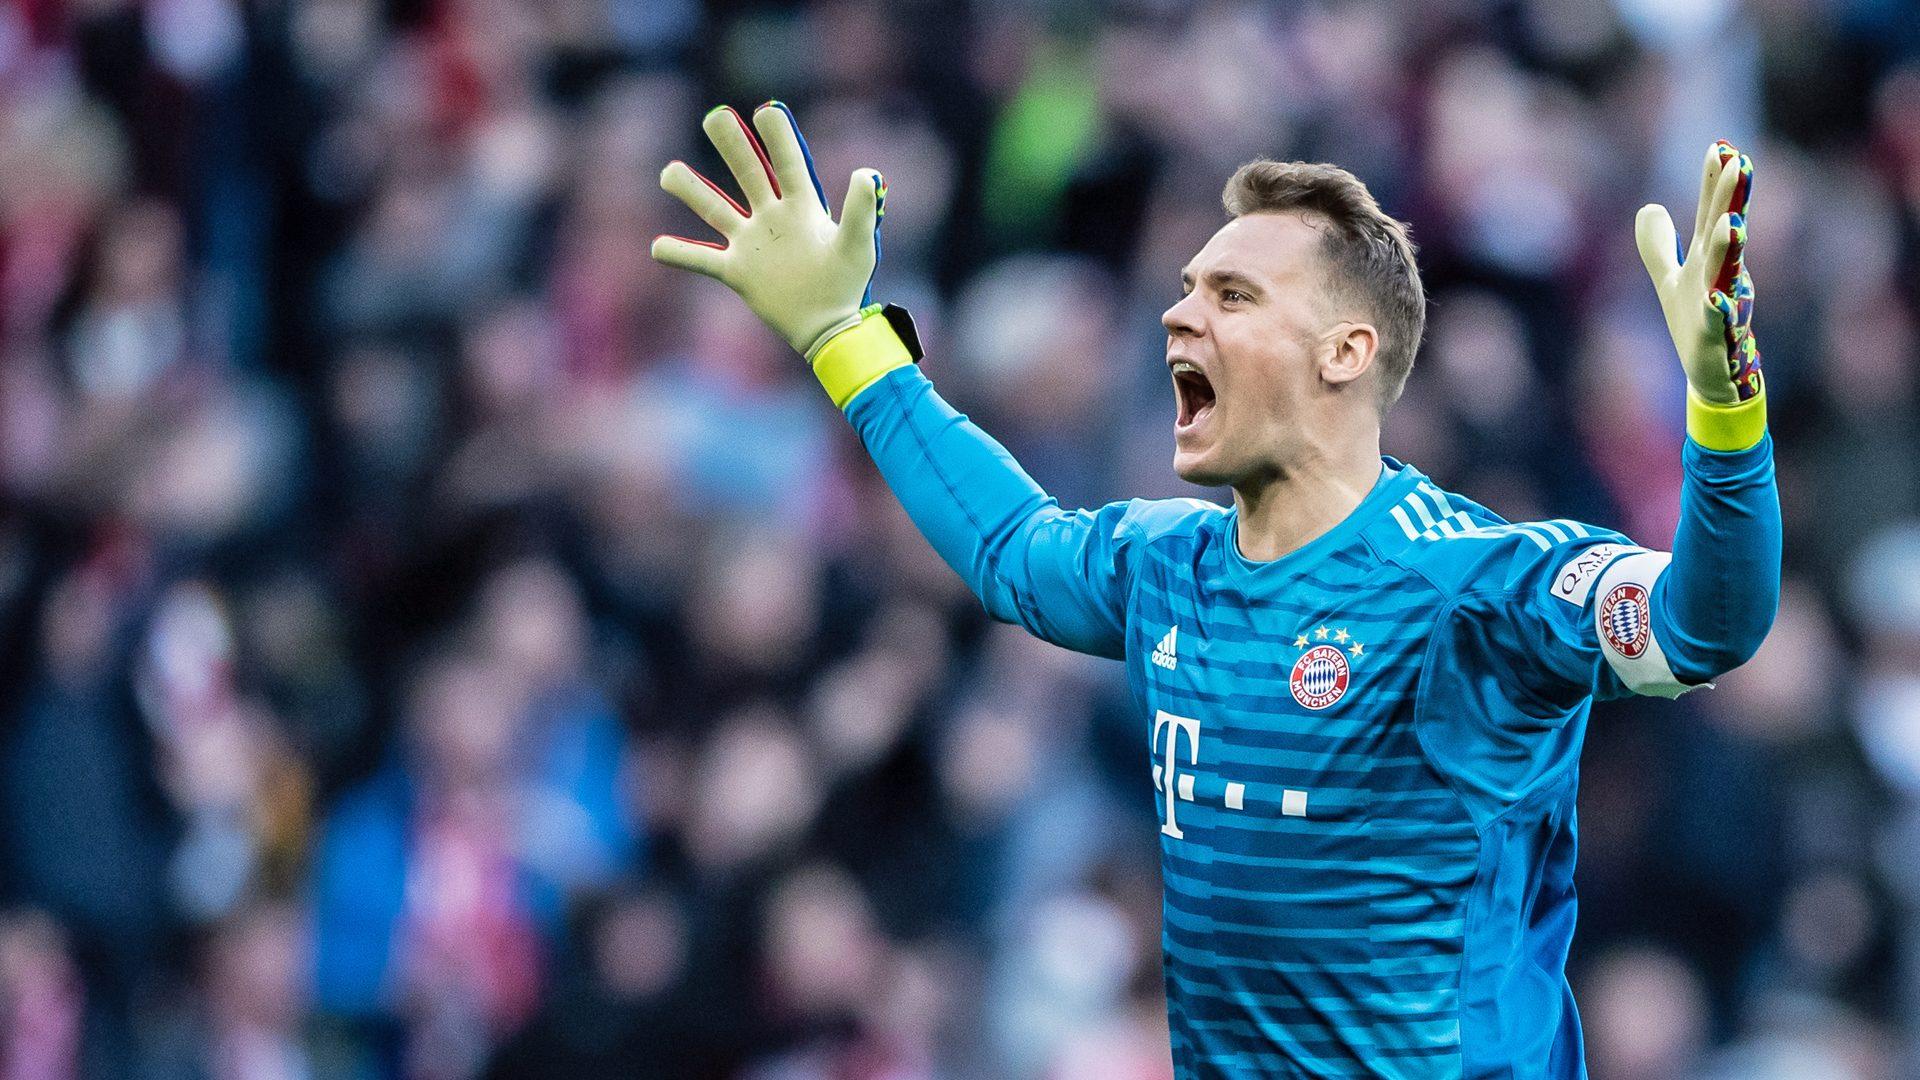 Bundesliga | Manuel Neuer: 10 things on the Bayern Munich